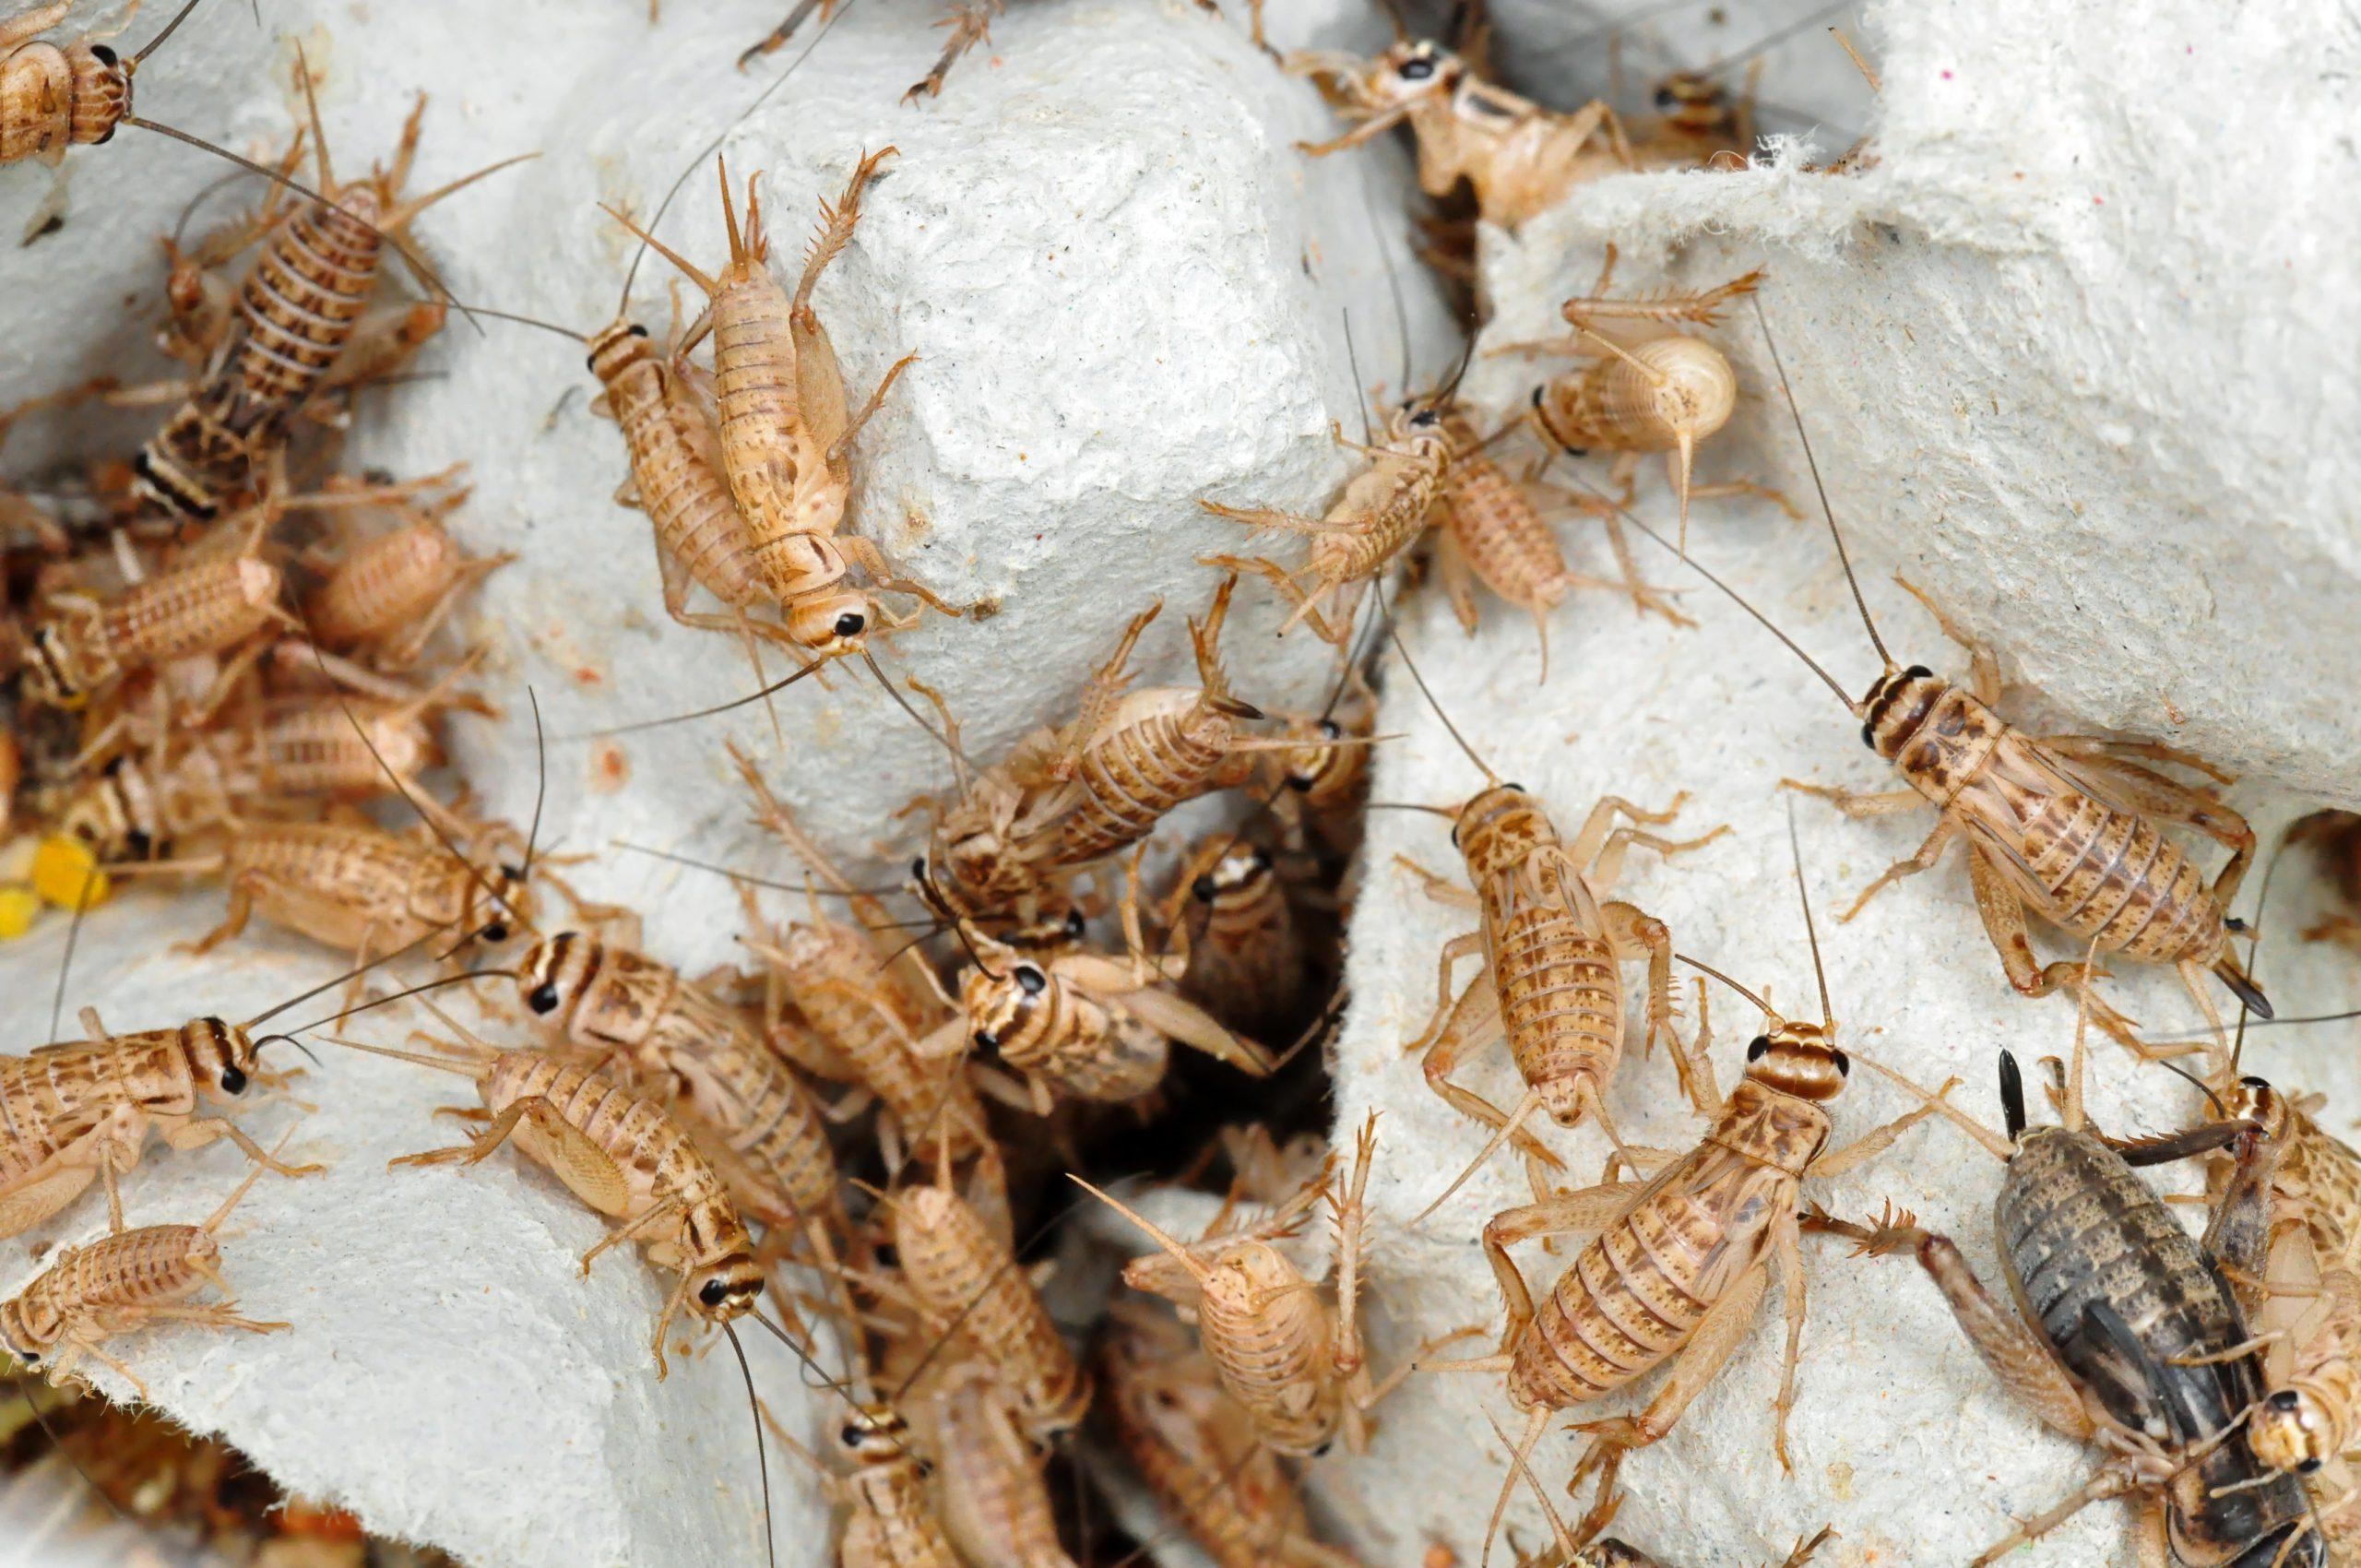 Live crickets inside a cricket habitat.